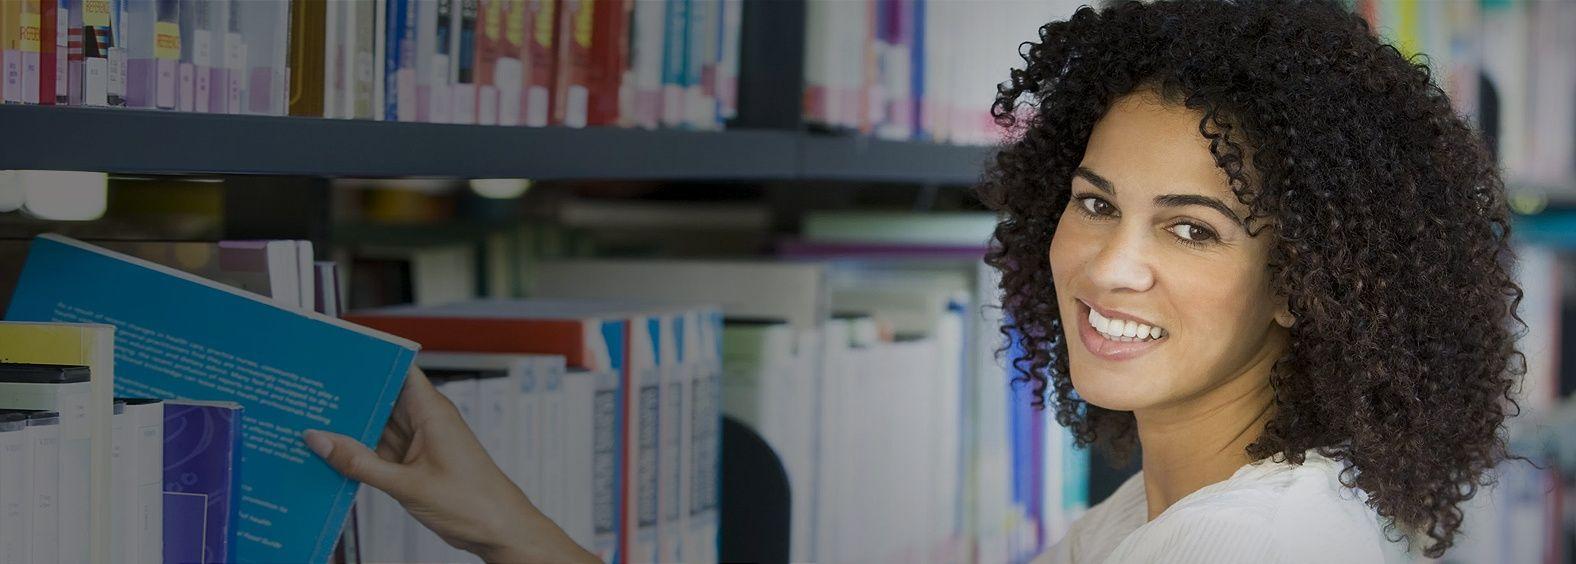 woman at book shelves.jpg